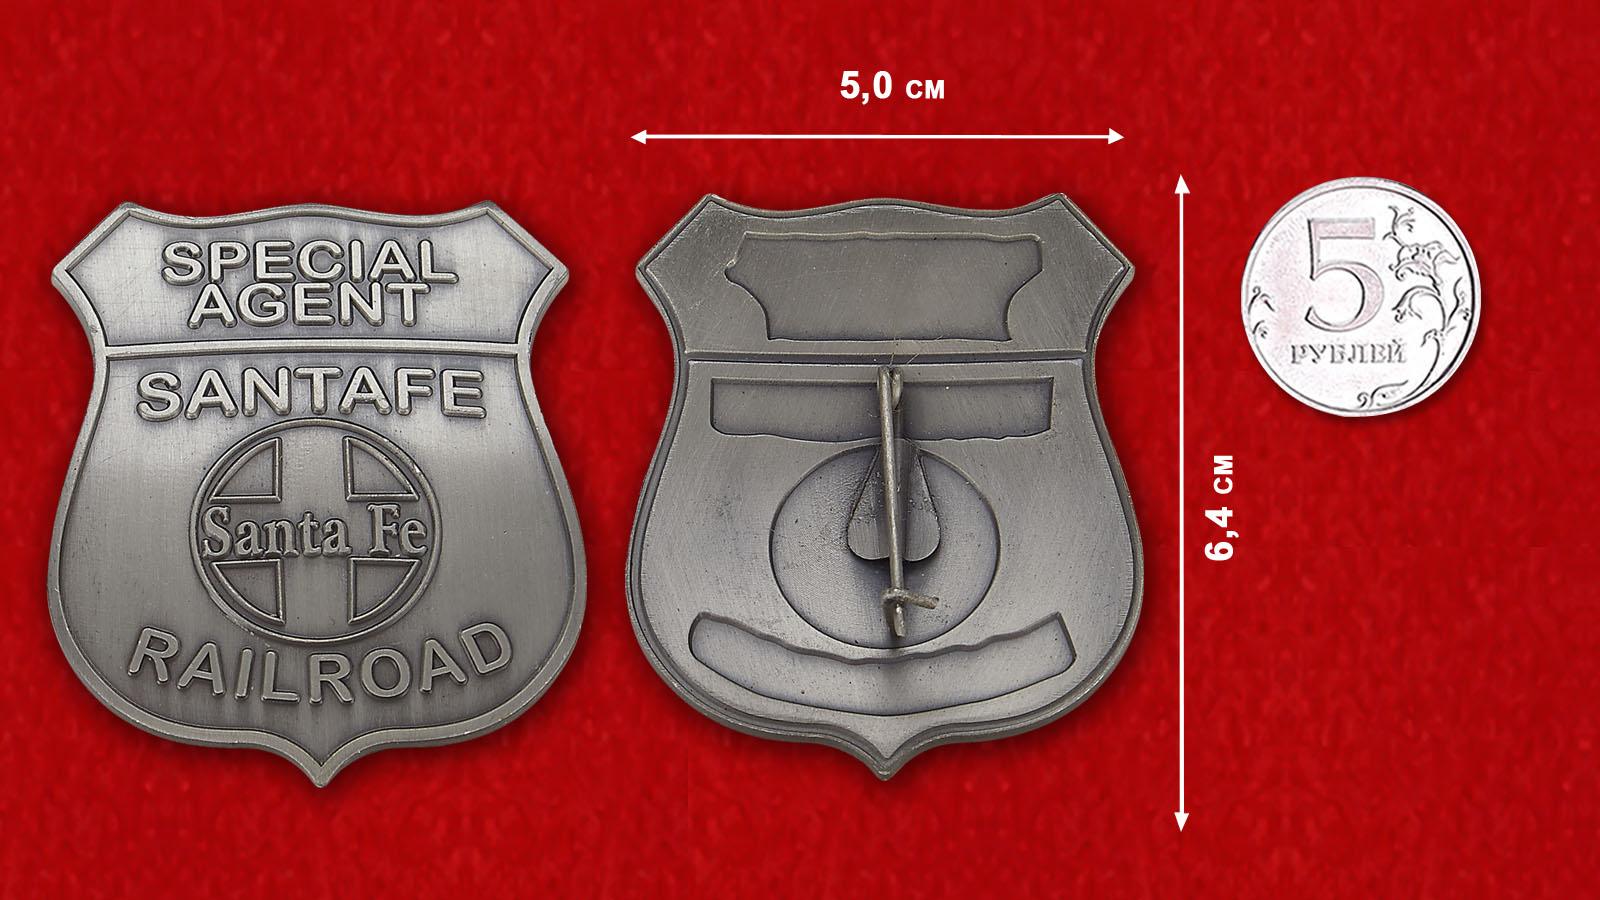 Special Agent Raulroad Sata Fe Token - comparative size